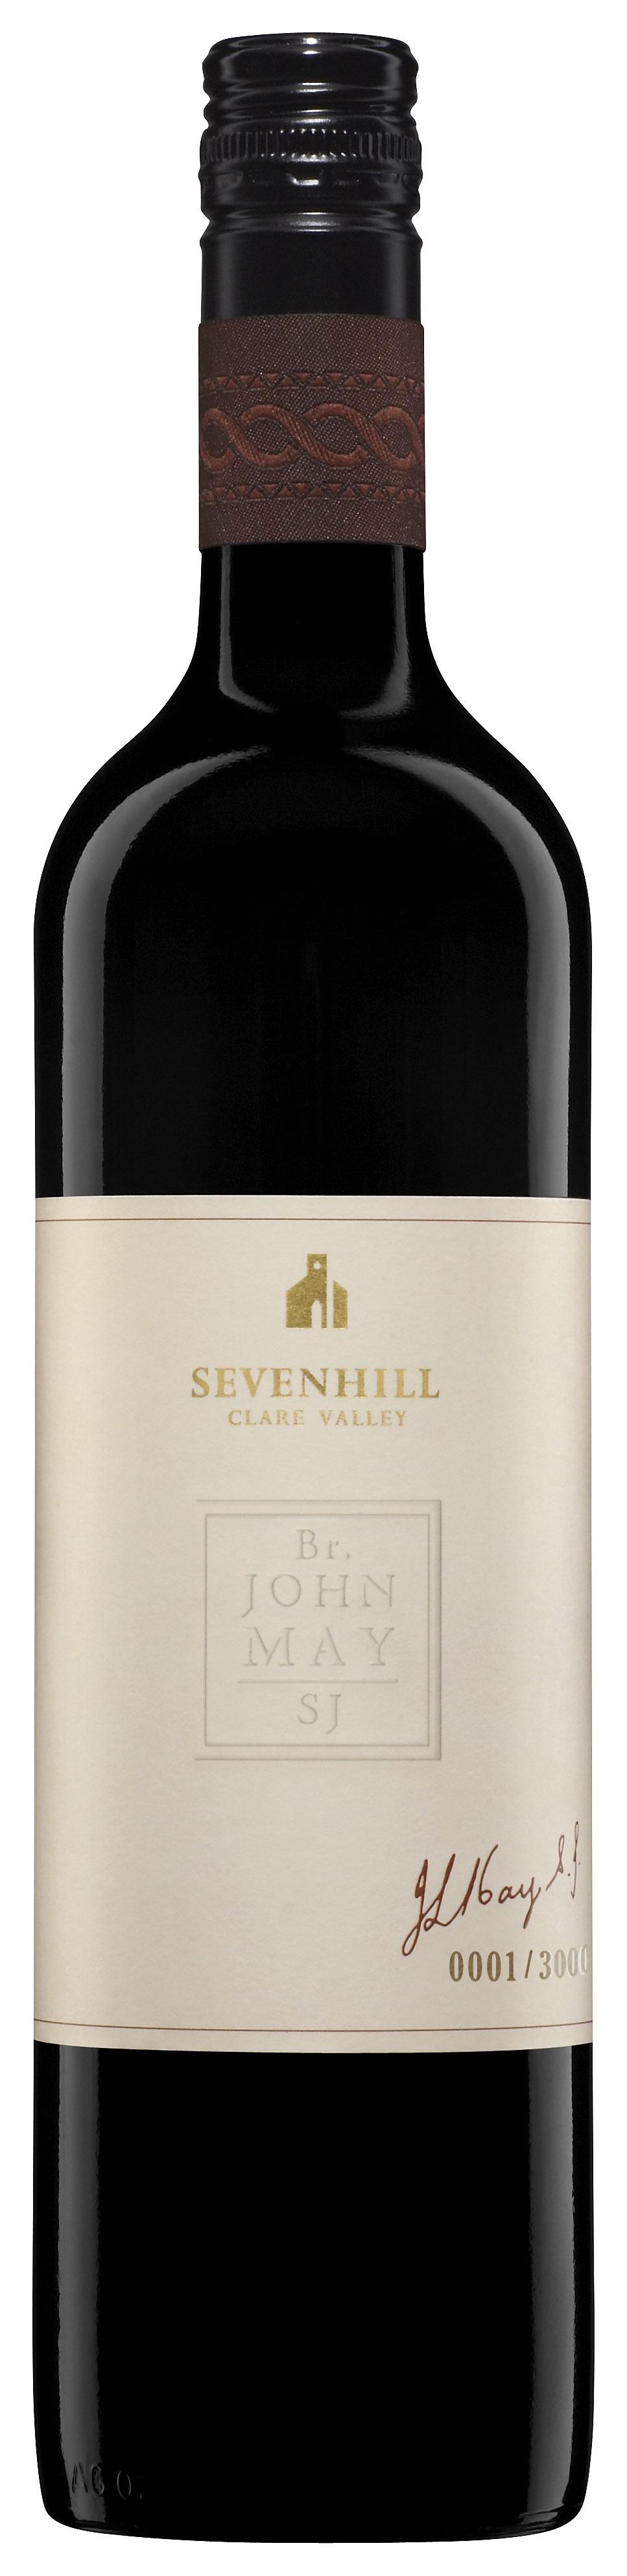 sevenhill-br-john-may-rr-shiraz